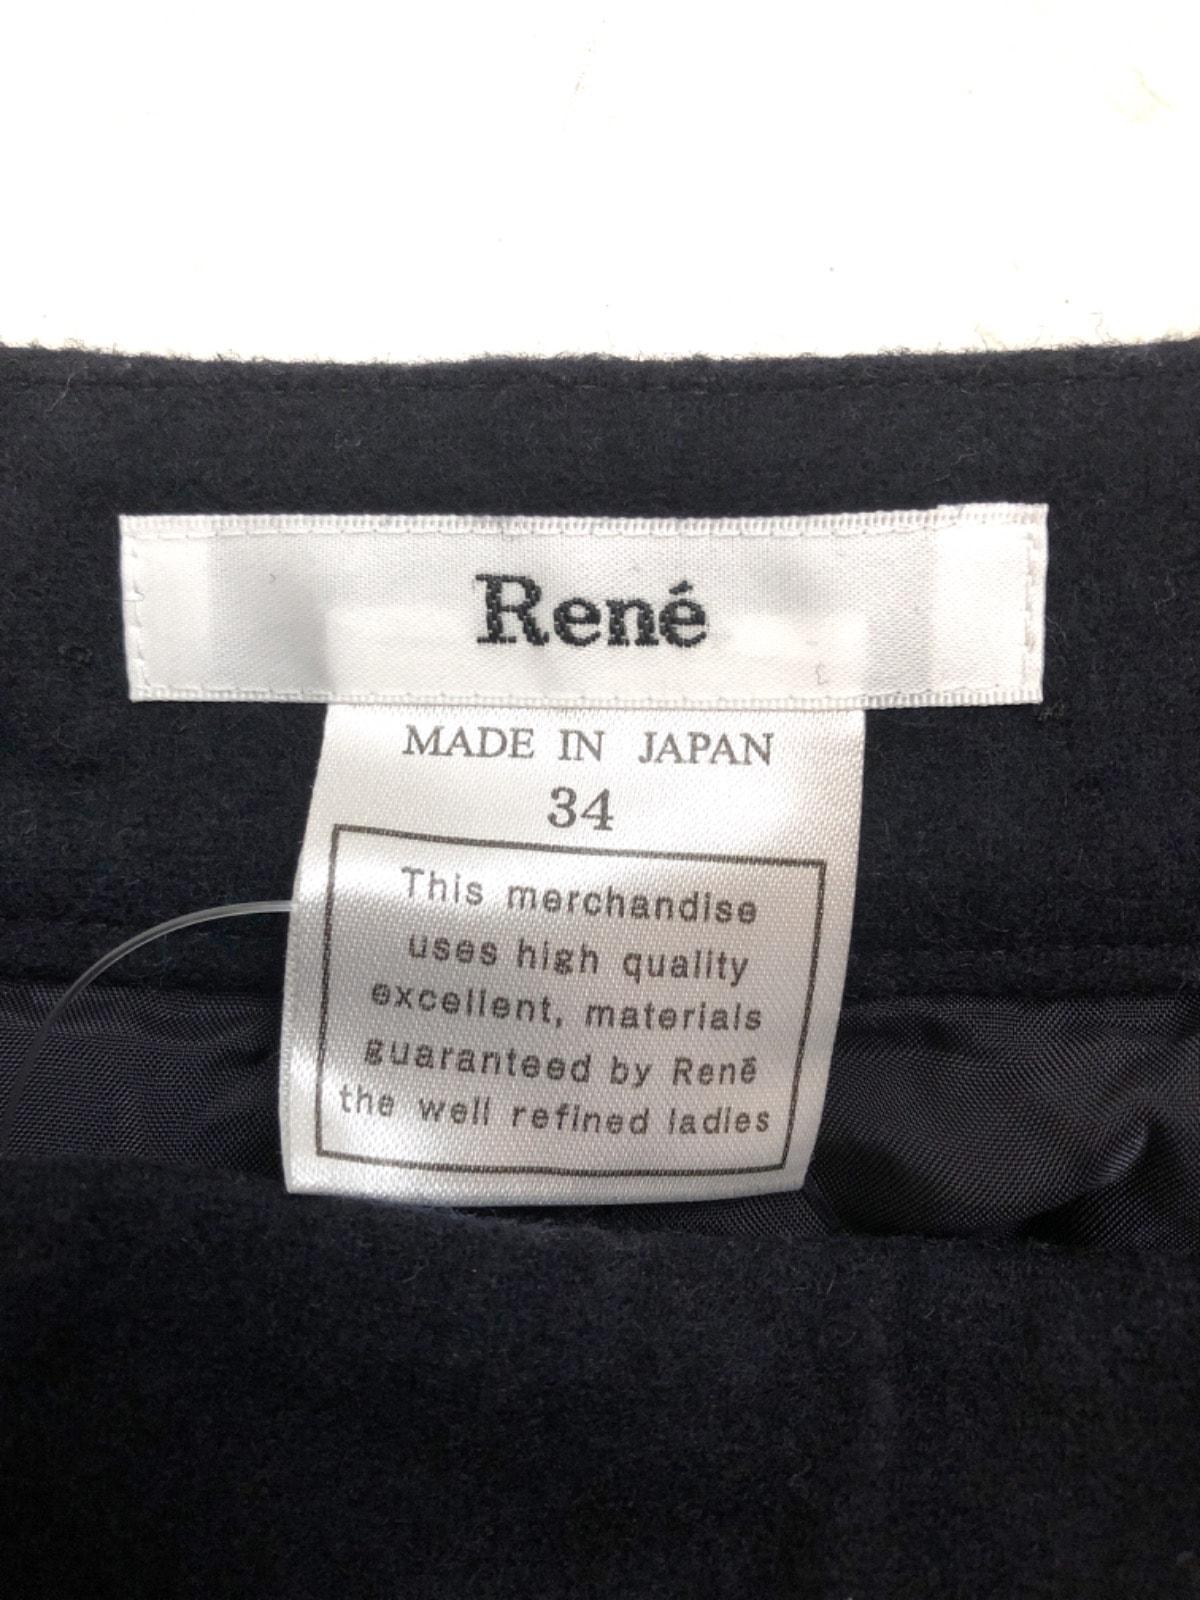 Rene(ルネ)のパンツ